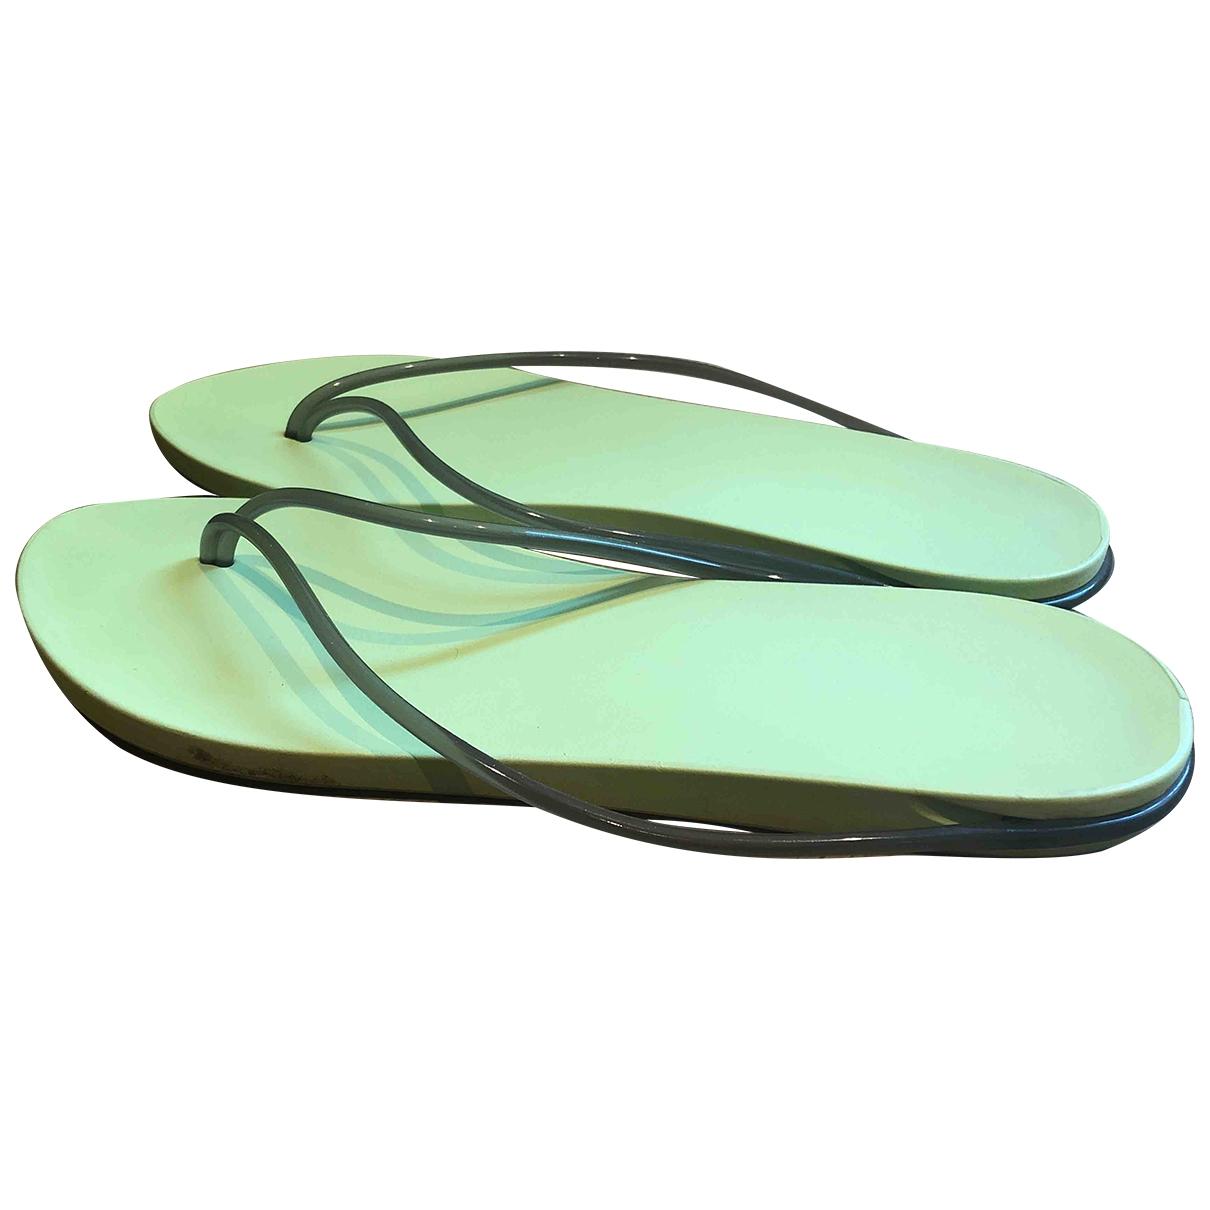 Starck \N Sandalen in  Gruen Kunststoff